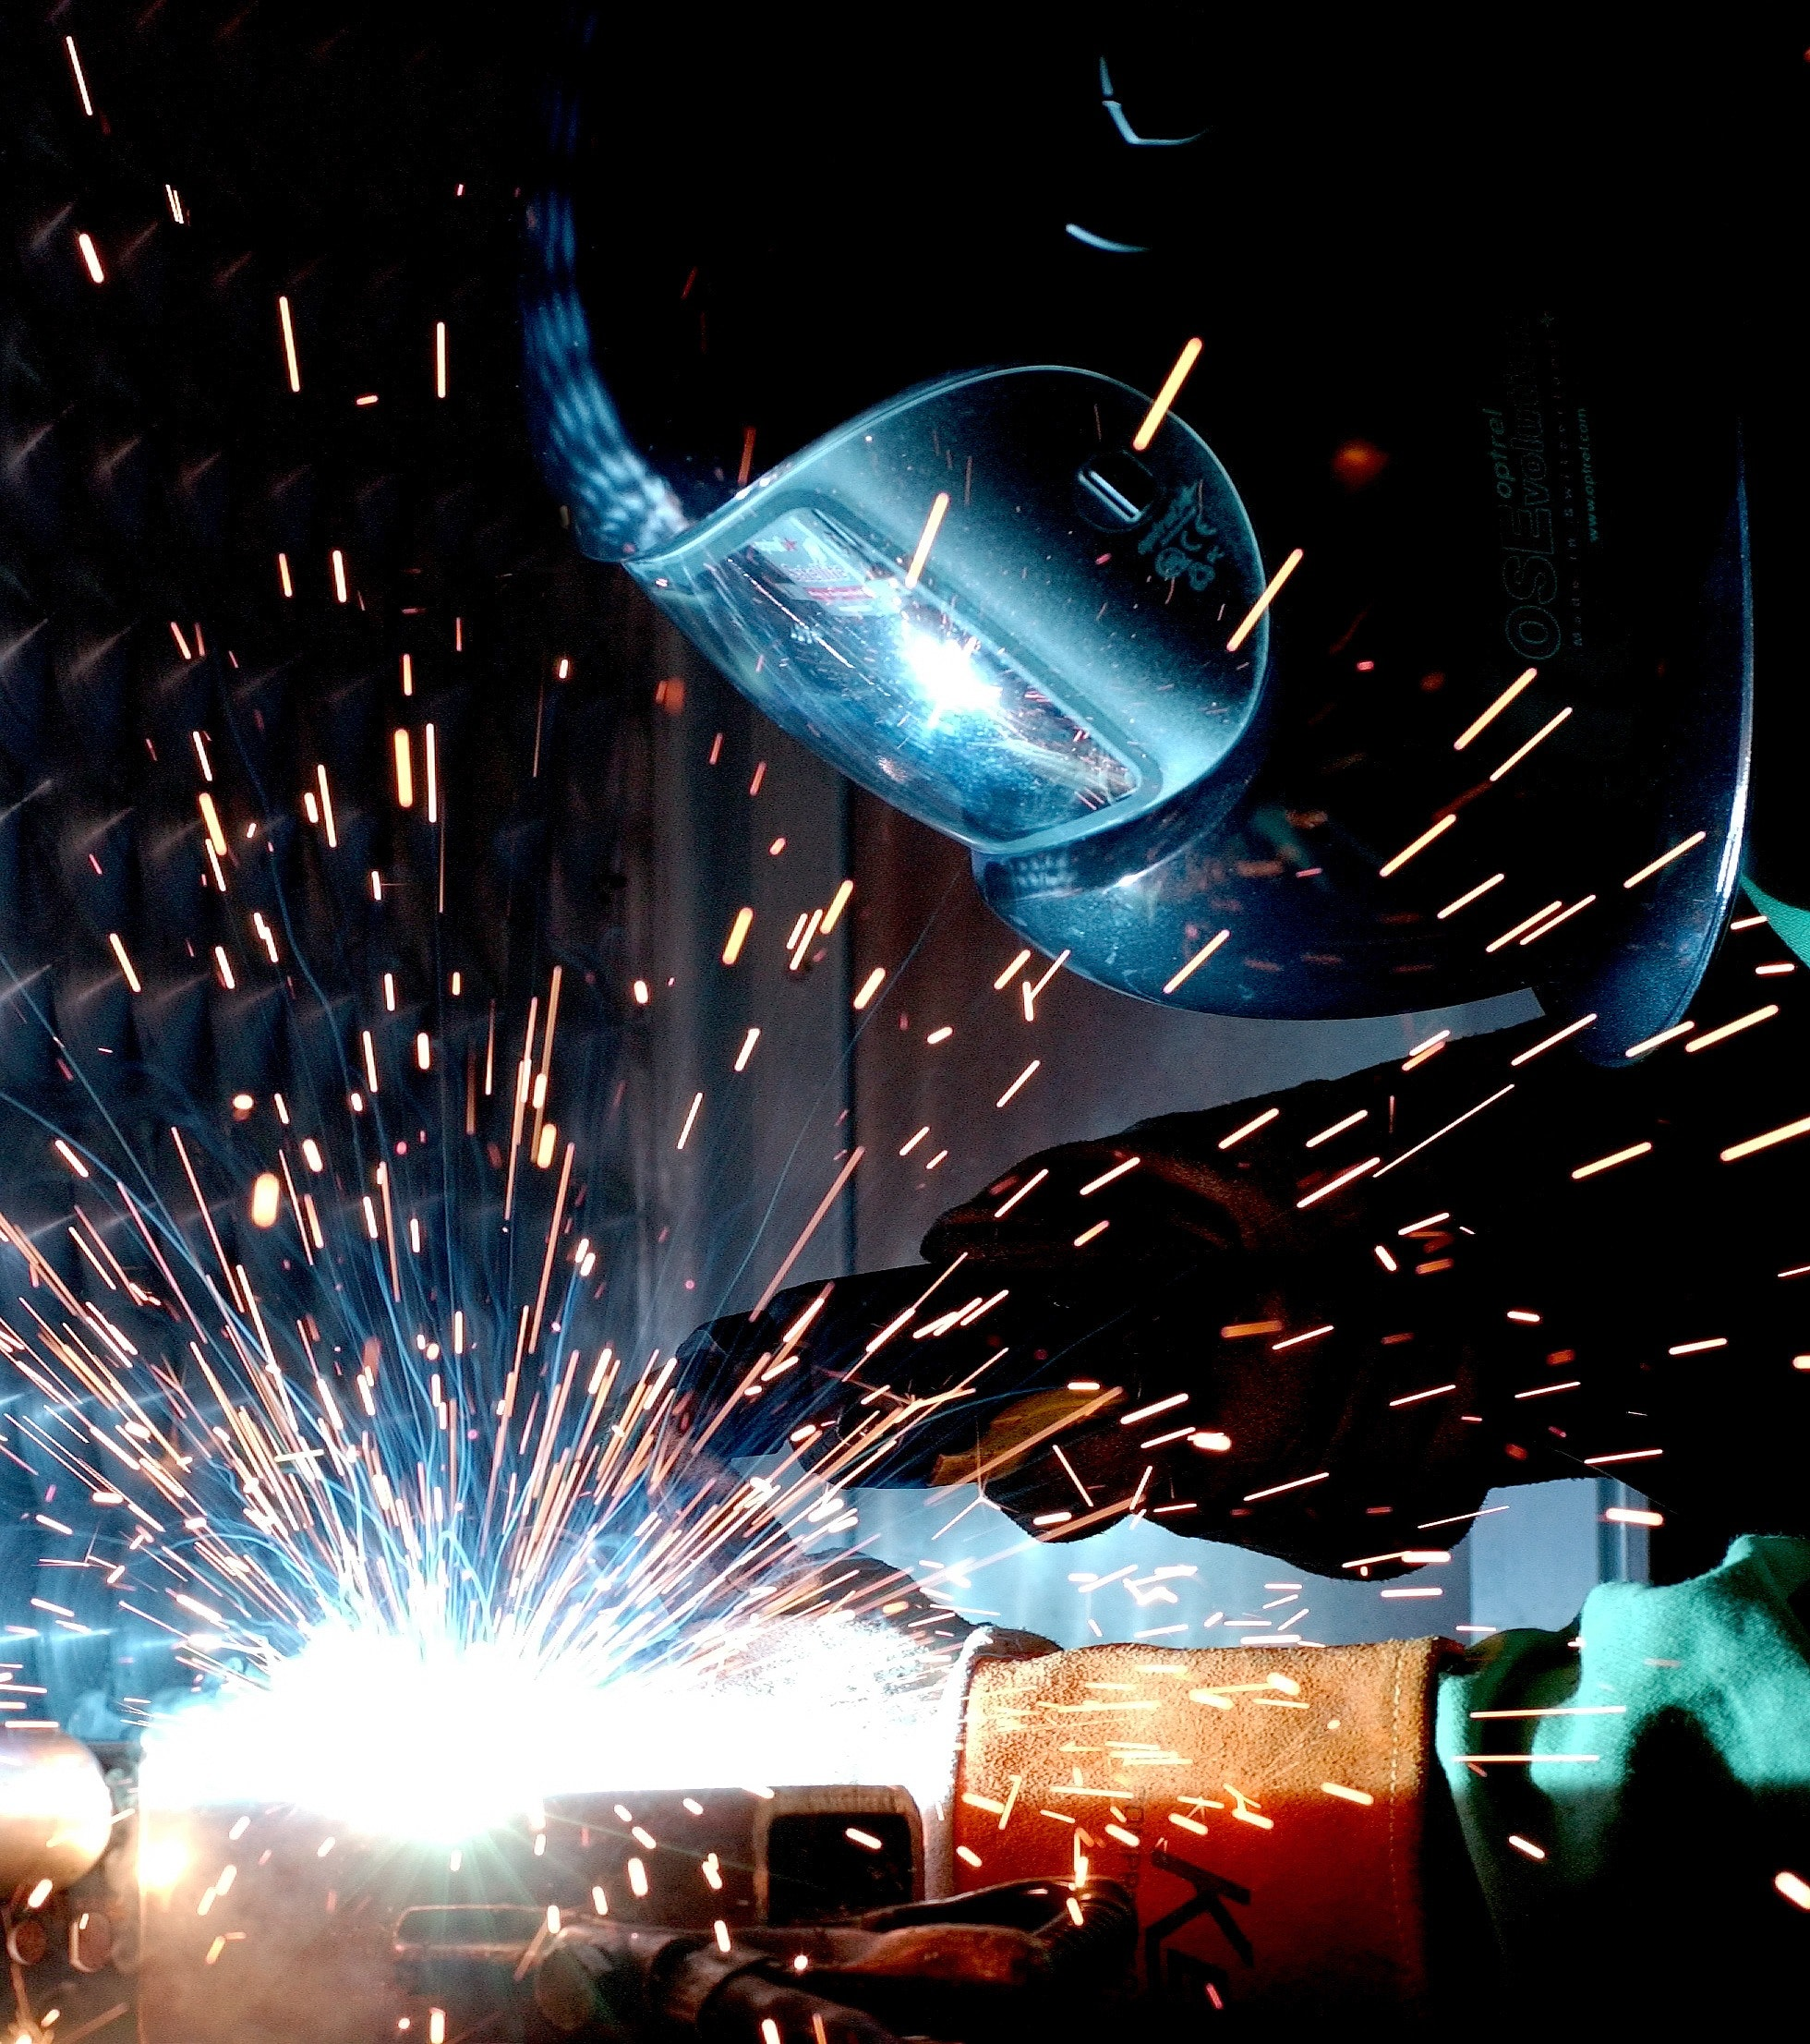 industry-metal-fire-radio-73833